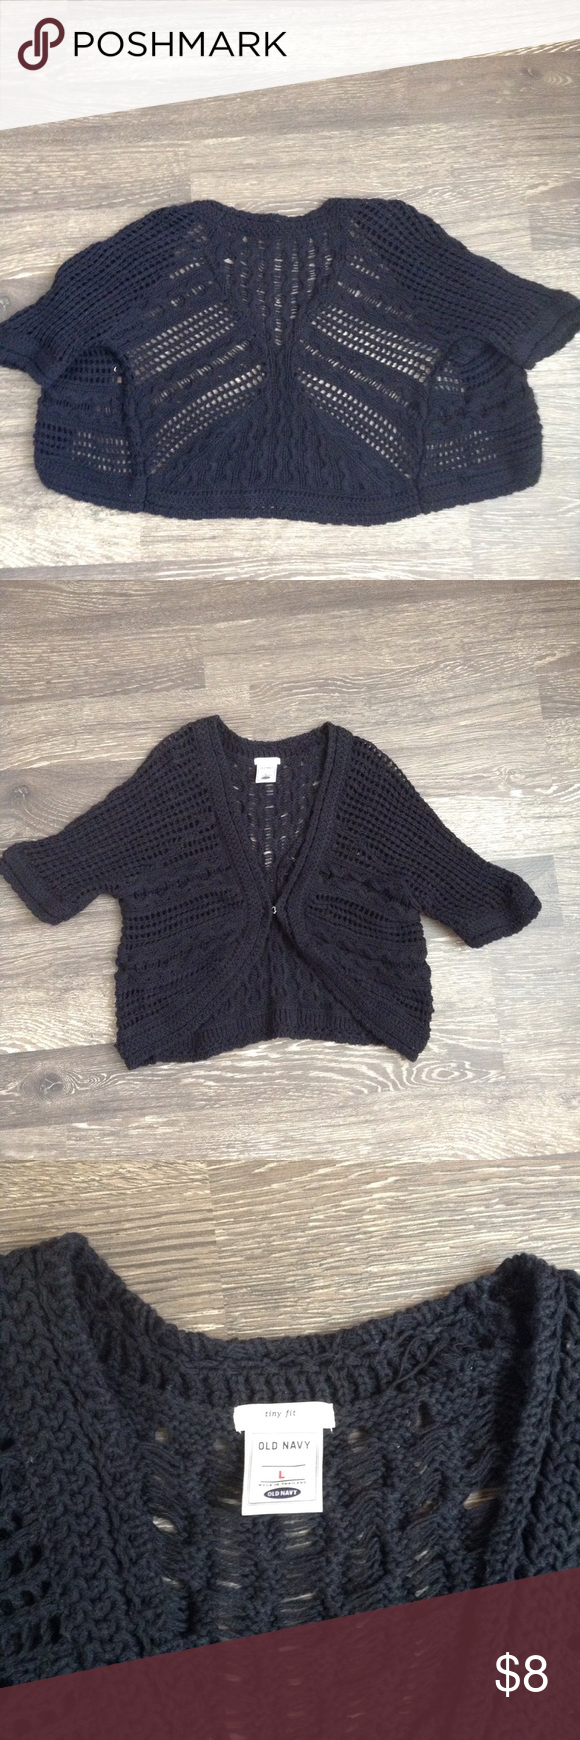 Old navy black crochet cardigan | Summer dresses, Navy and Navy ...